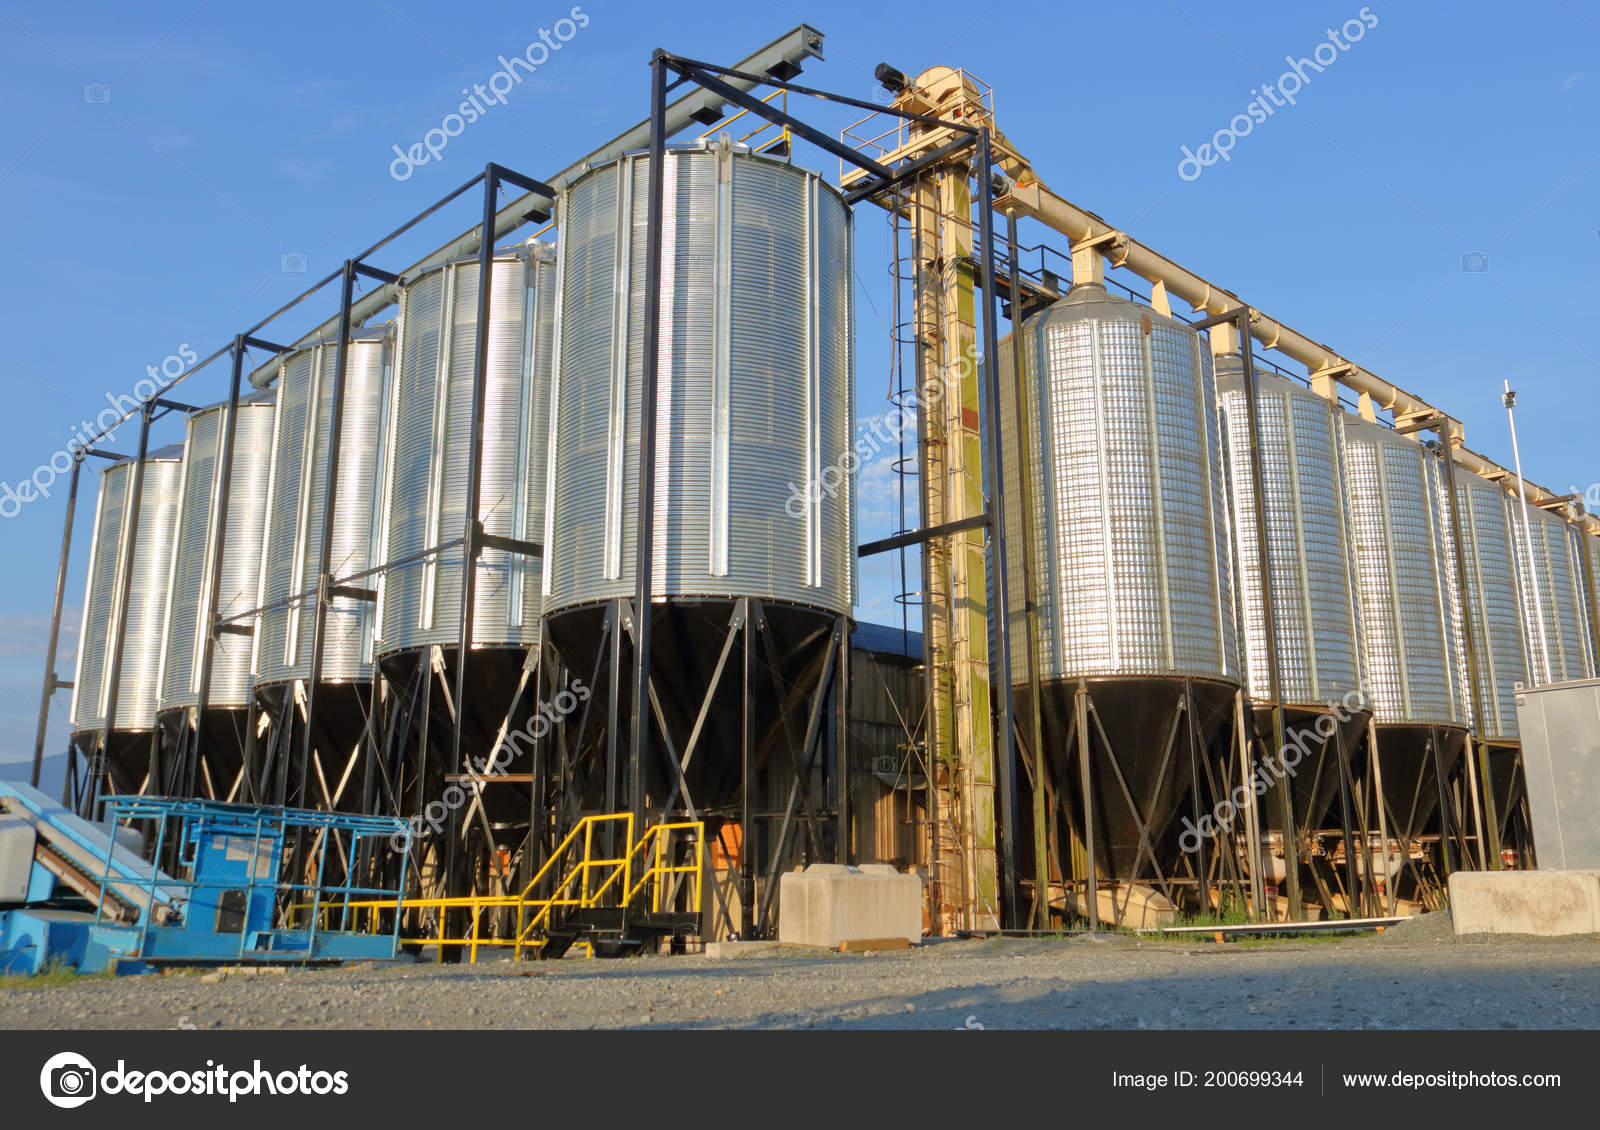 Large Industrial Pellet Grain Bins Used Containing Livestock